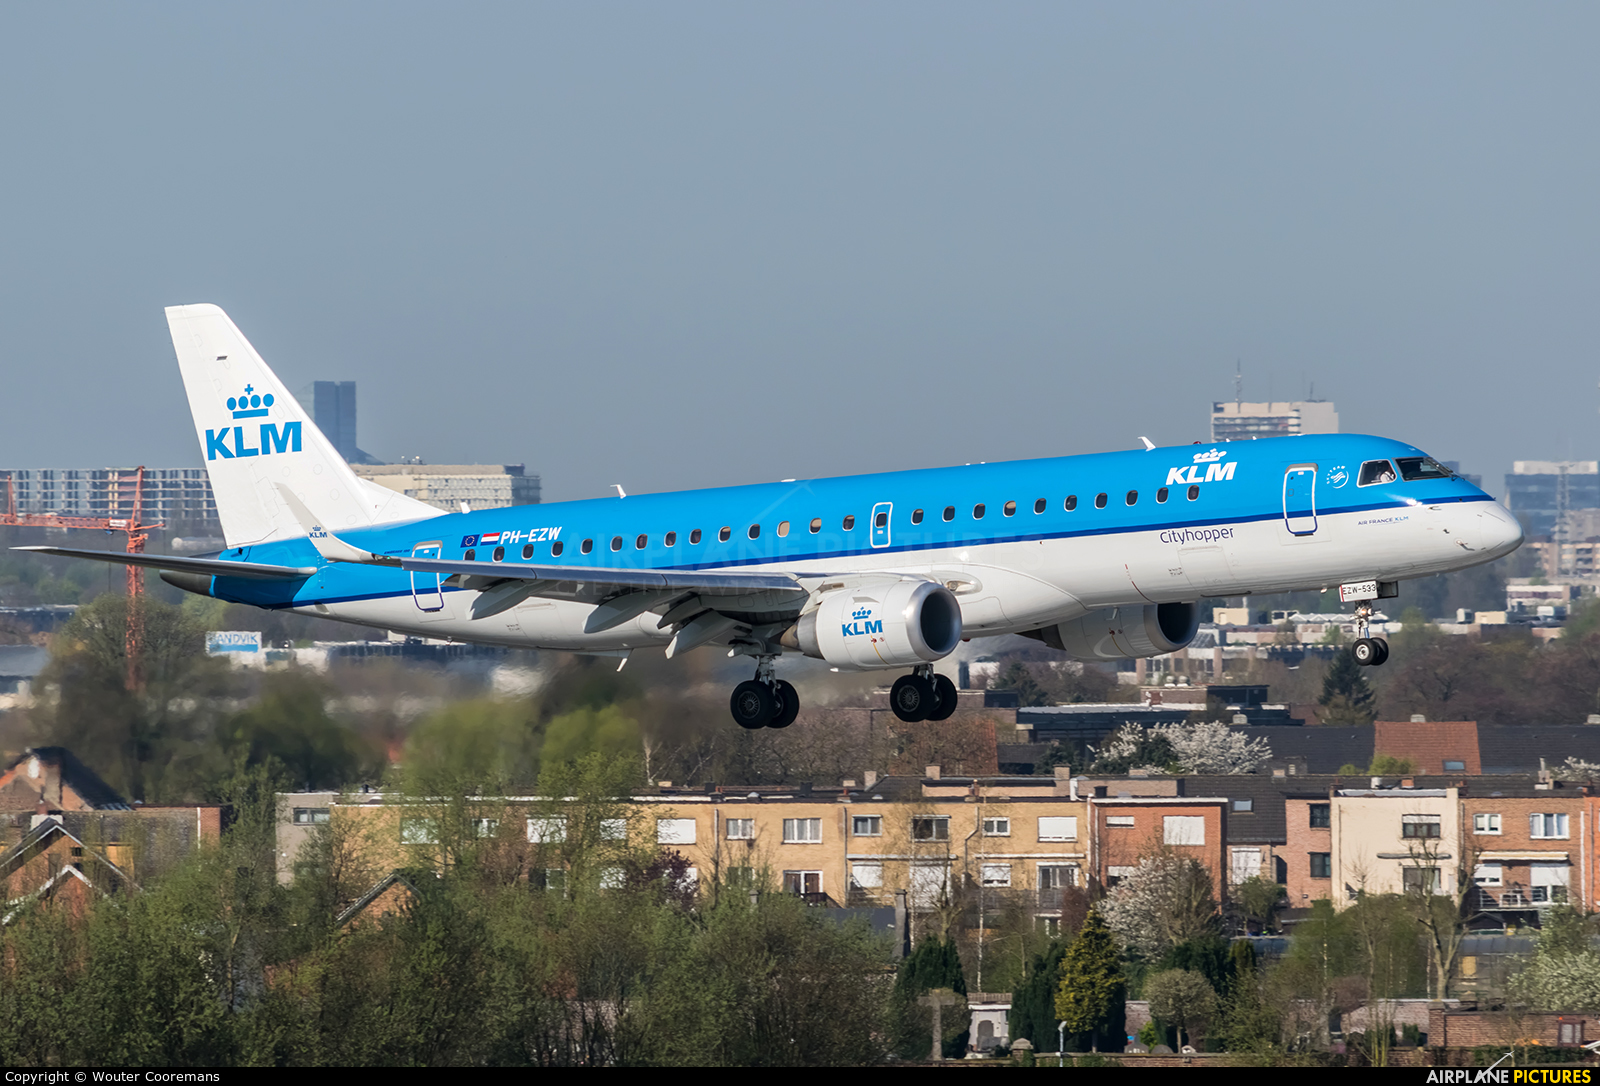 KLM Cityhopper PH-EZW aircraft at Brussels - Zaventem